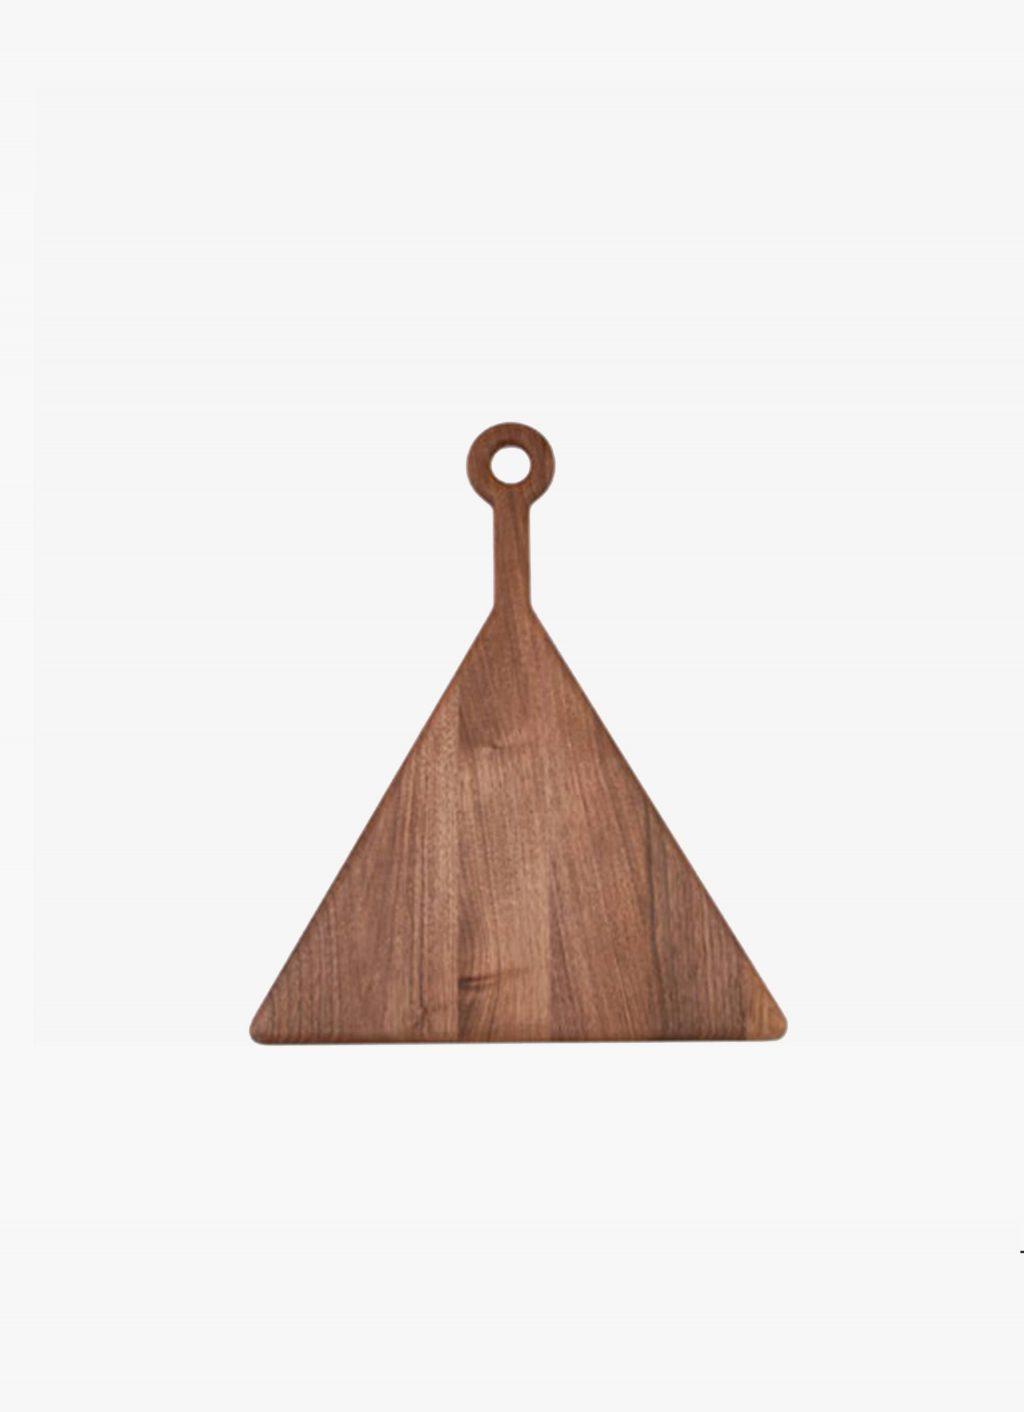 Fort Standard - Cutting Board - American Walnut - Triangle